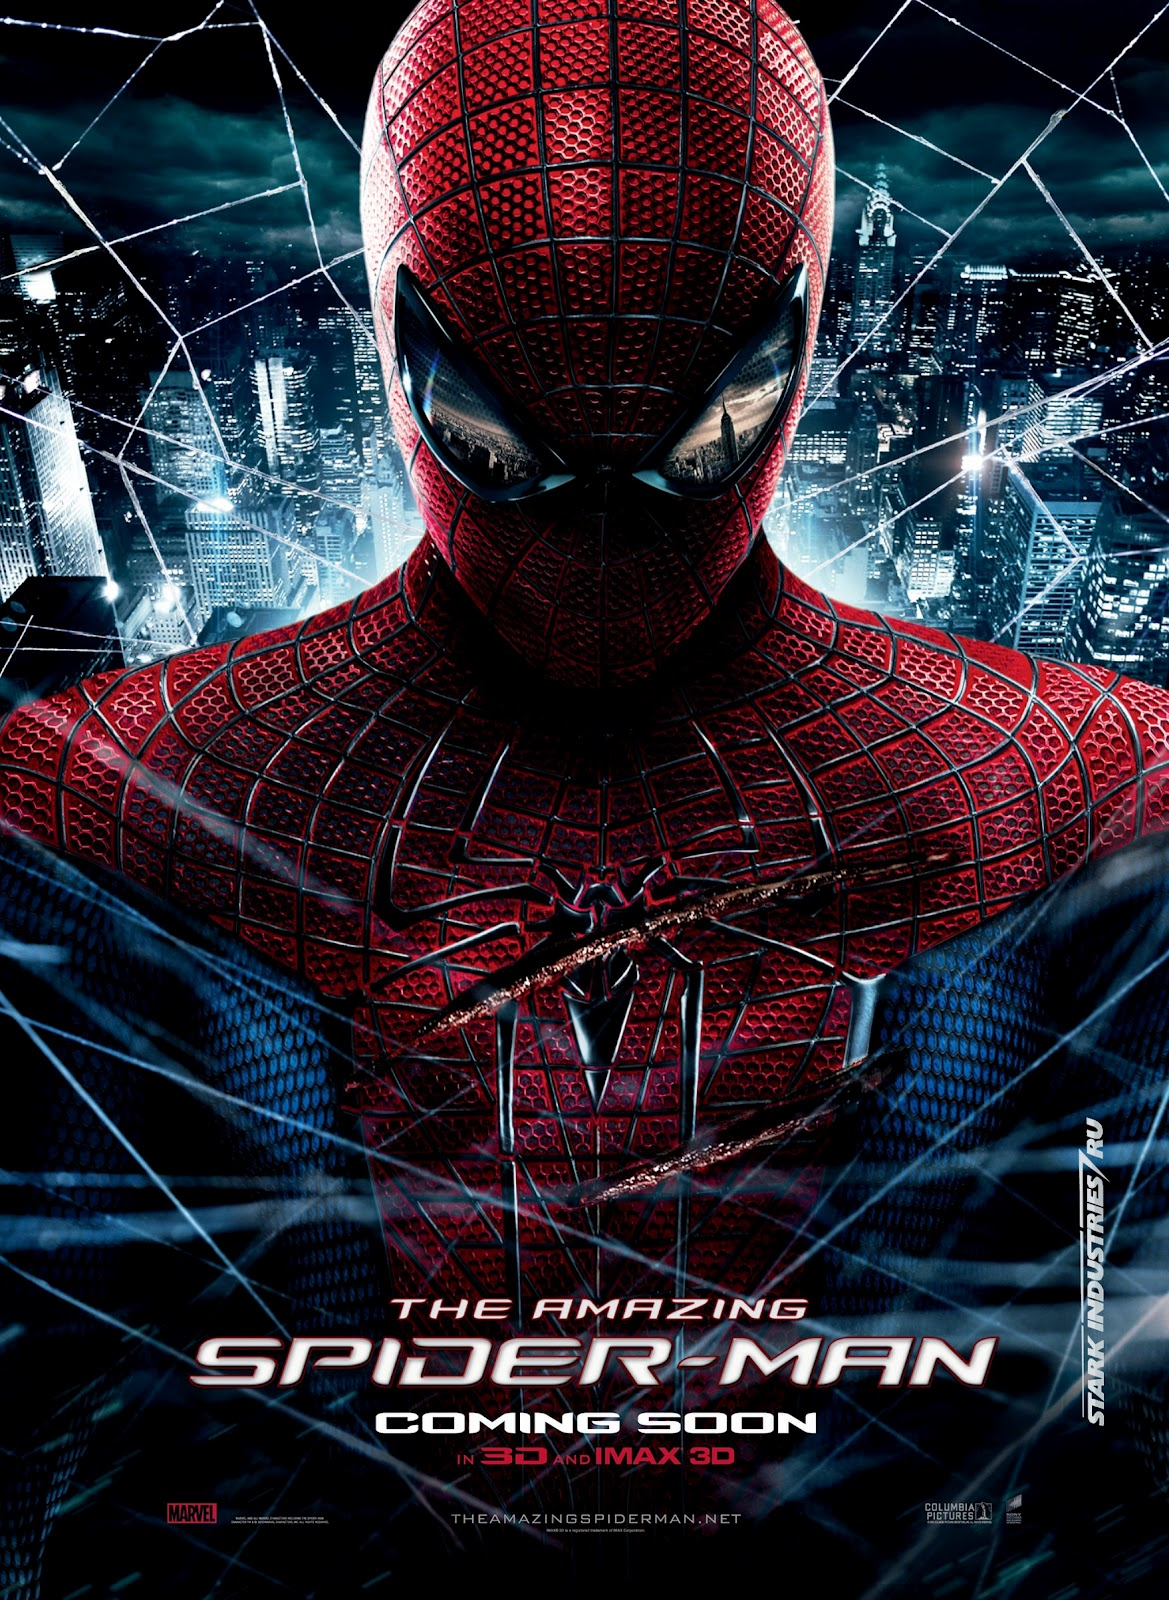 http://4.bp.blogspot.com/-4WTReSgAgxw/T_ovmZ7Wh_I/AAAAAAAAJ_o/D36zV7ImsvE/s1600/Amazing+Spider+Man.jpg